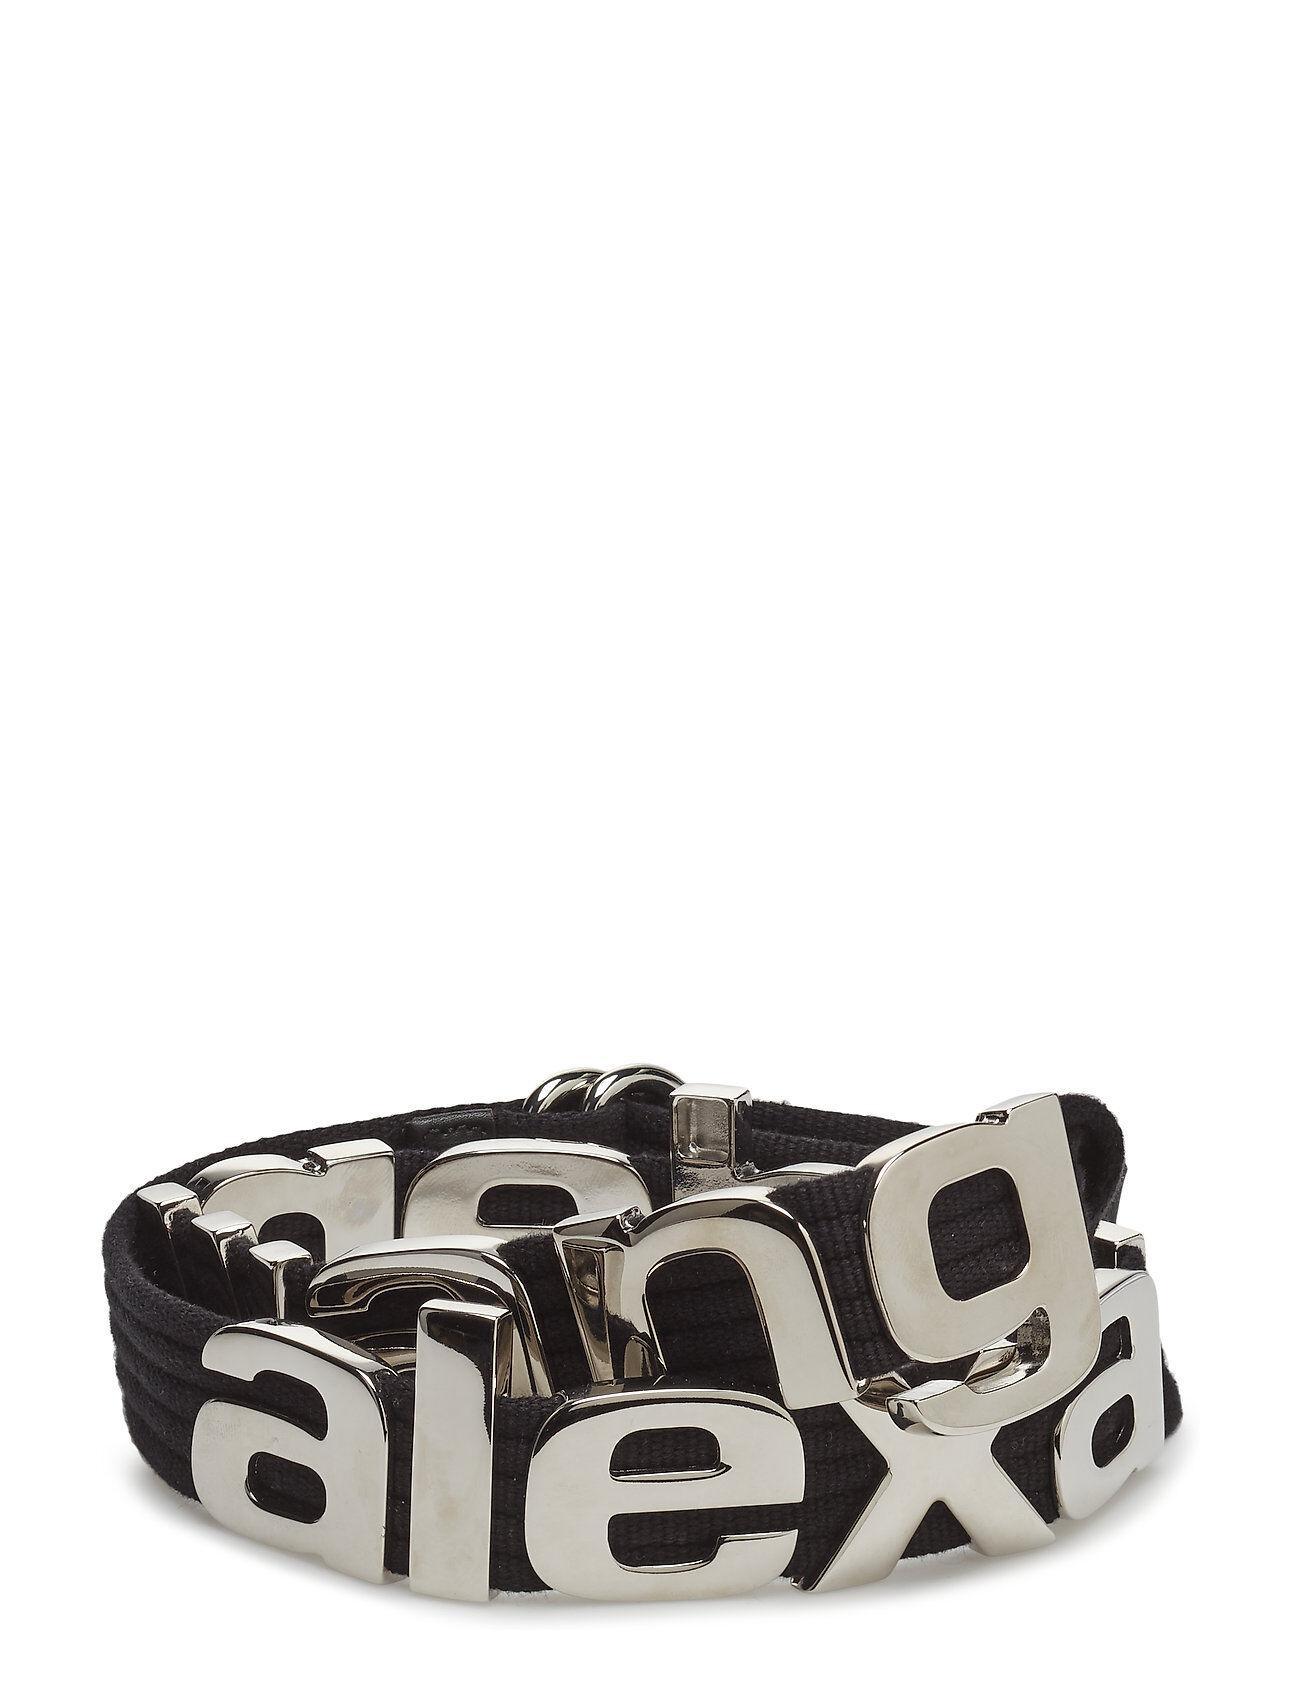 Alexander Wang Metal Letters Belt